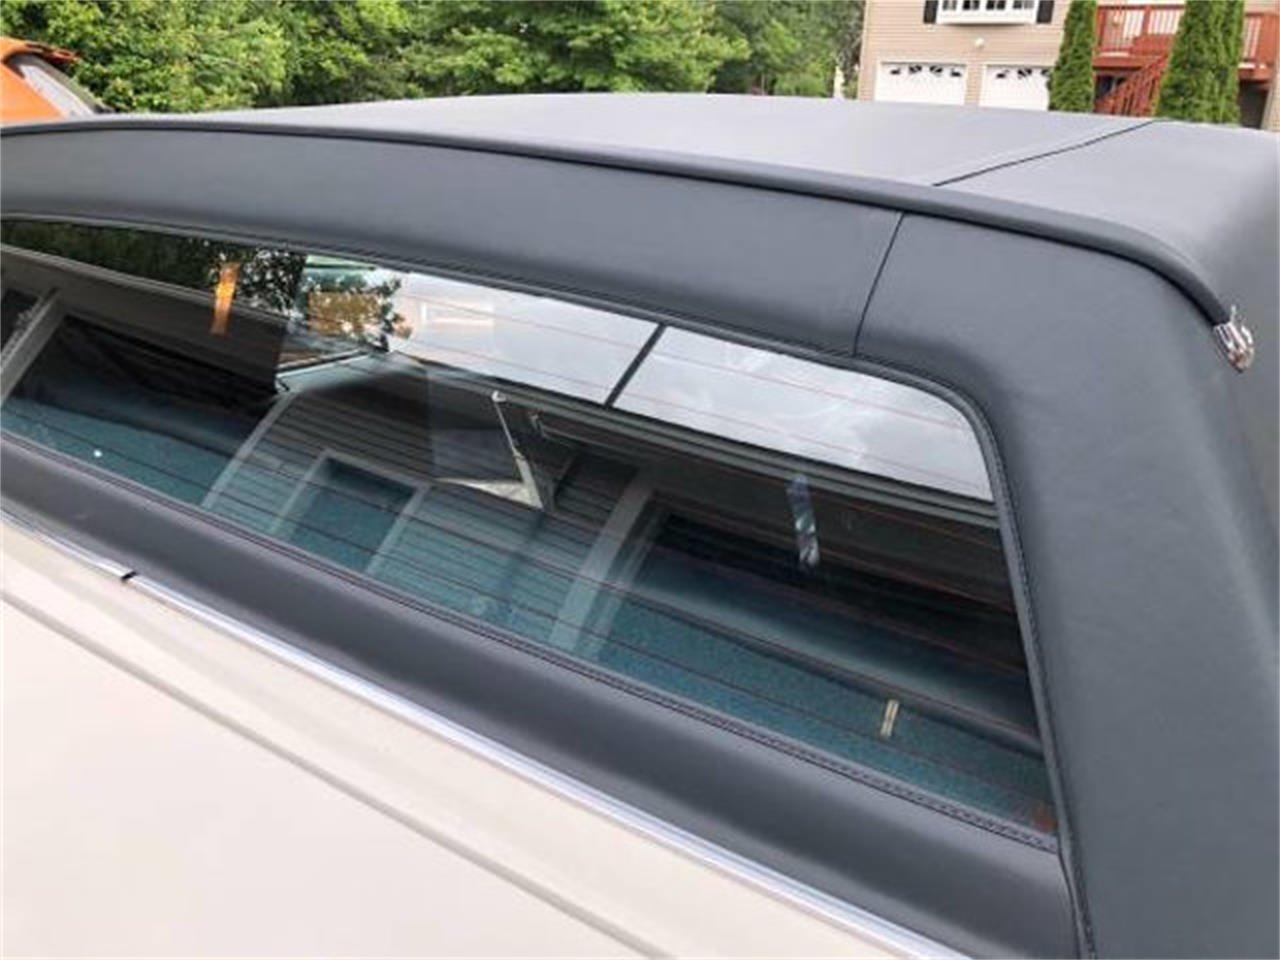 1985 Cadillac Eldorado (CC-1262725) for sale in Long Island, New York